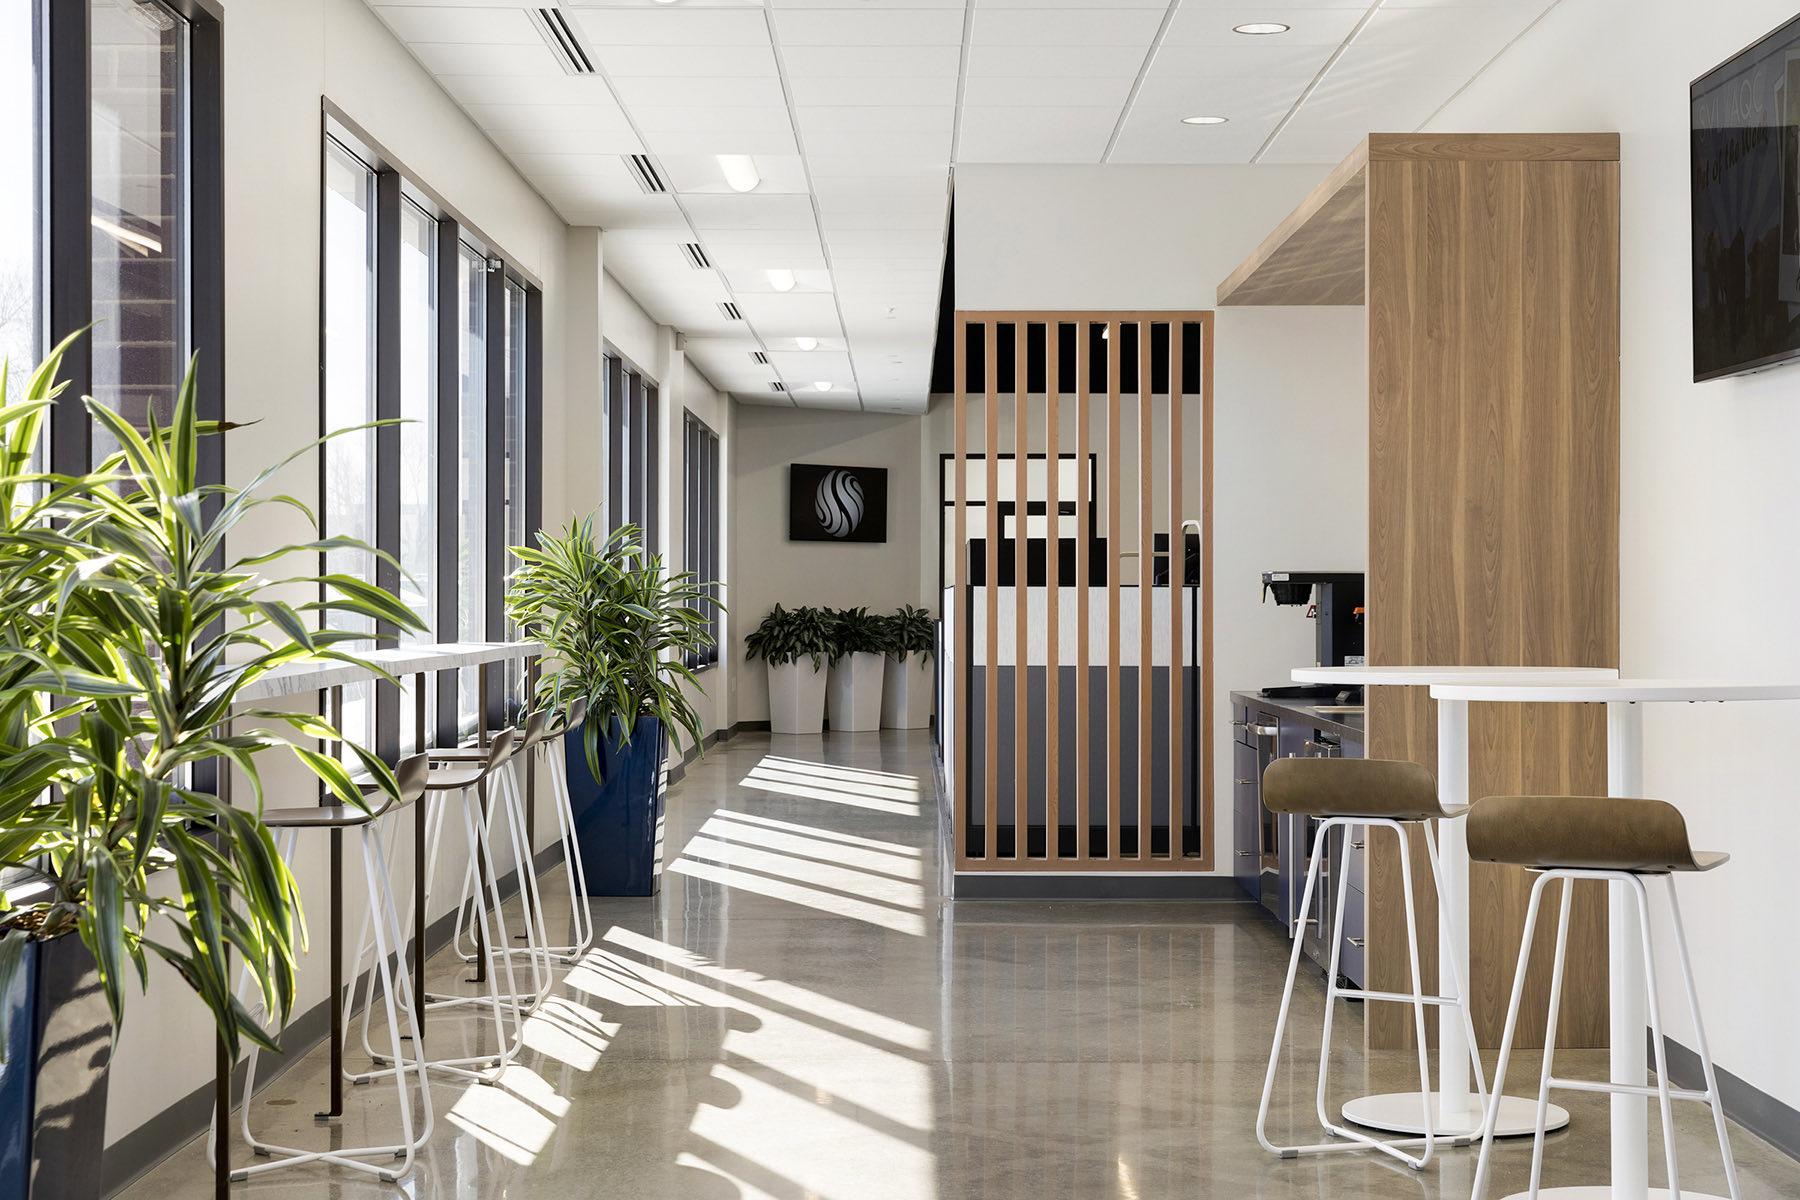 svl-minneapolis-office-9